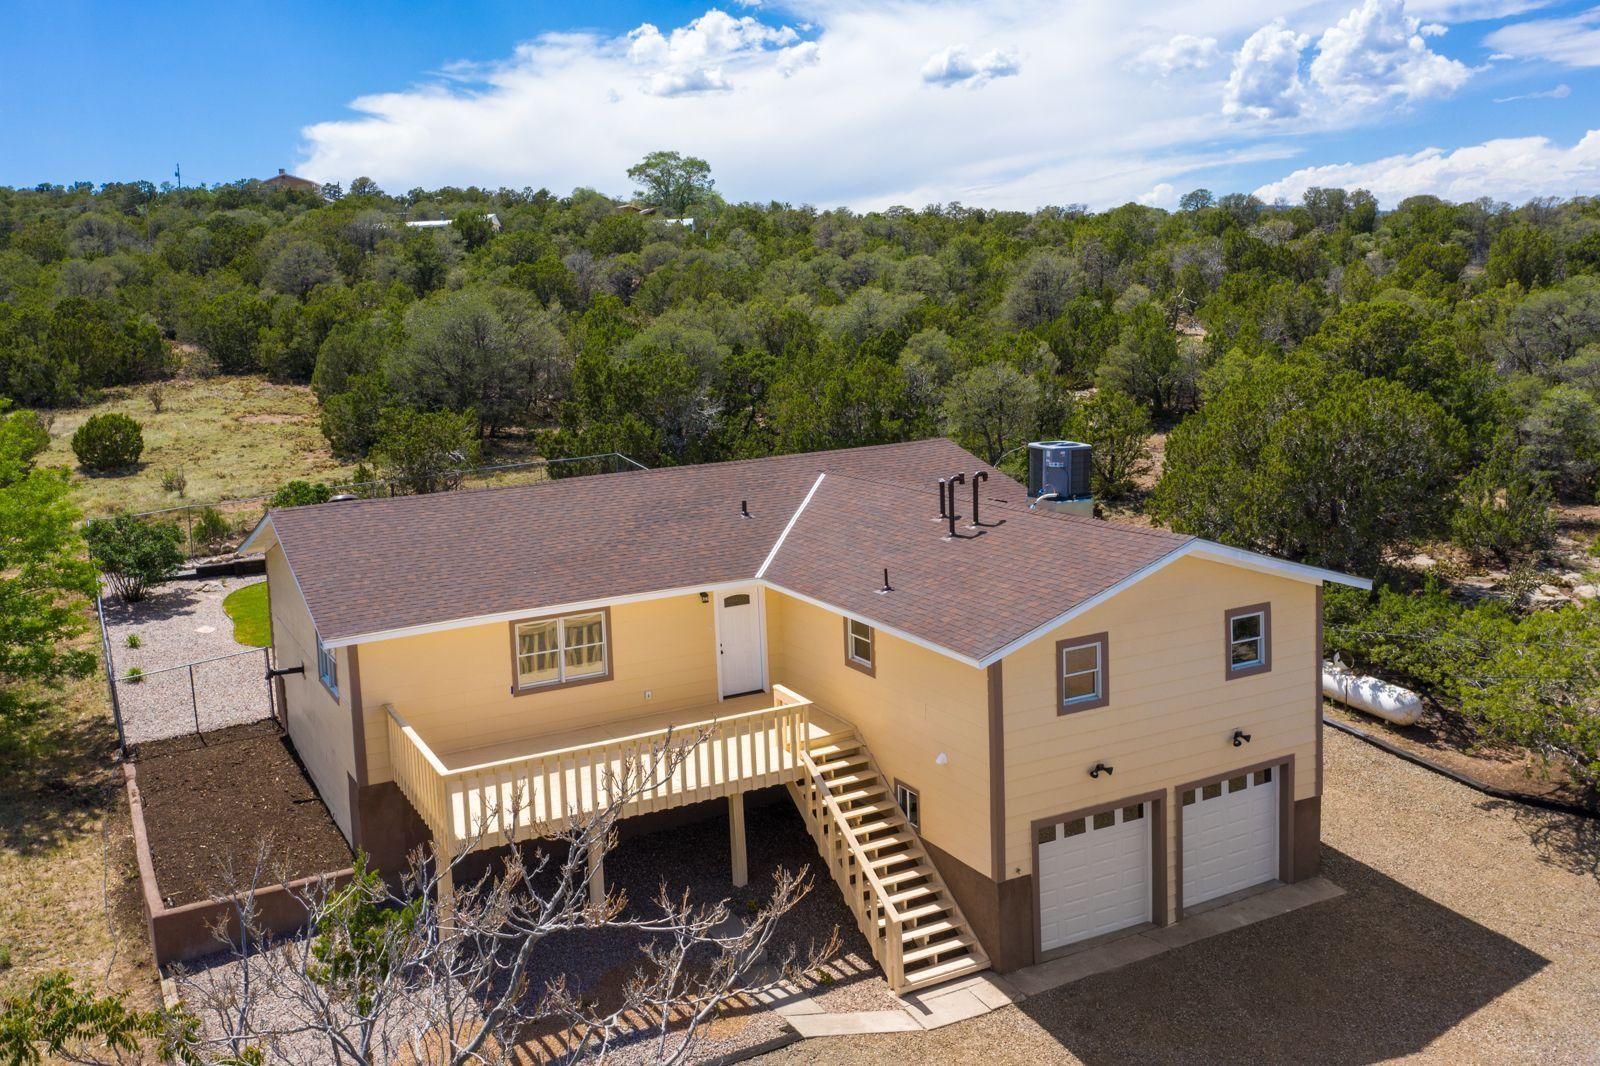 13 SOUTHWOOD Drive, Edgewood, NM 87015 - Edgewood, NM real estate listing